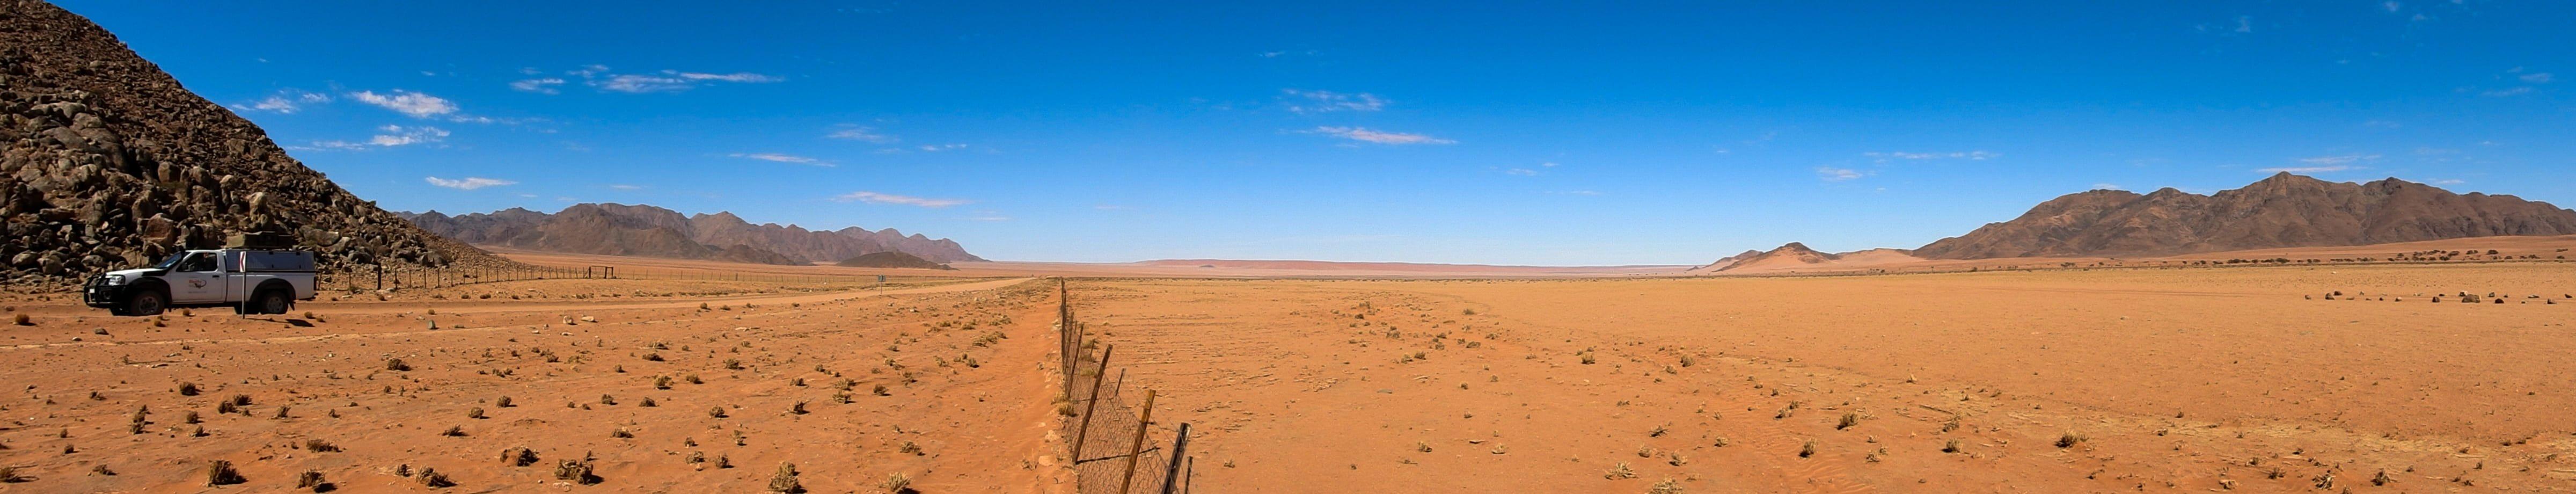 Namibia-D707-01